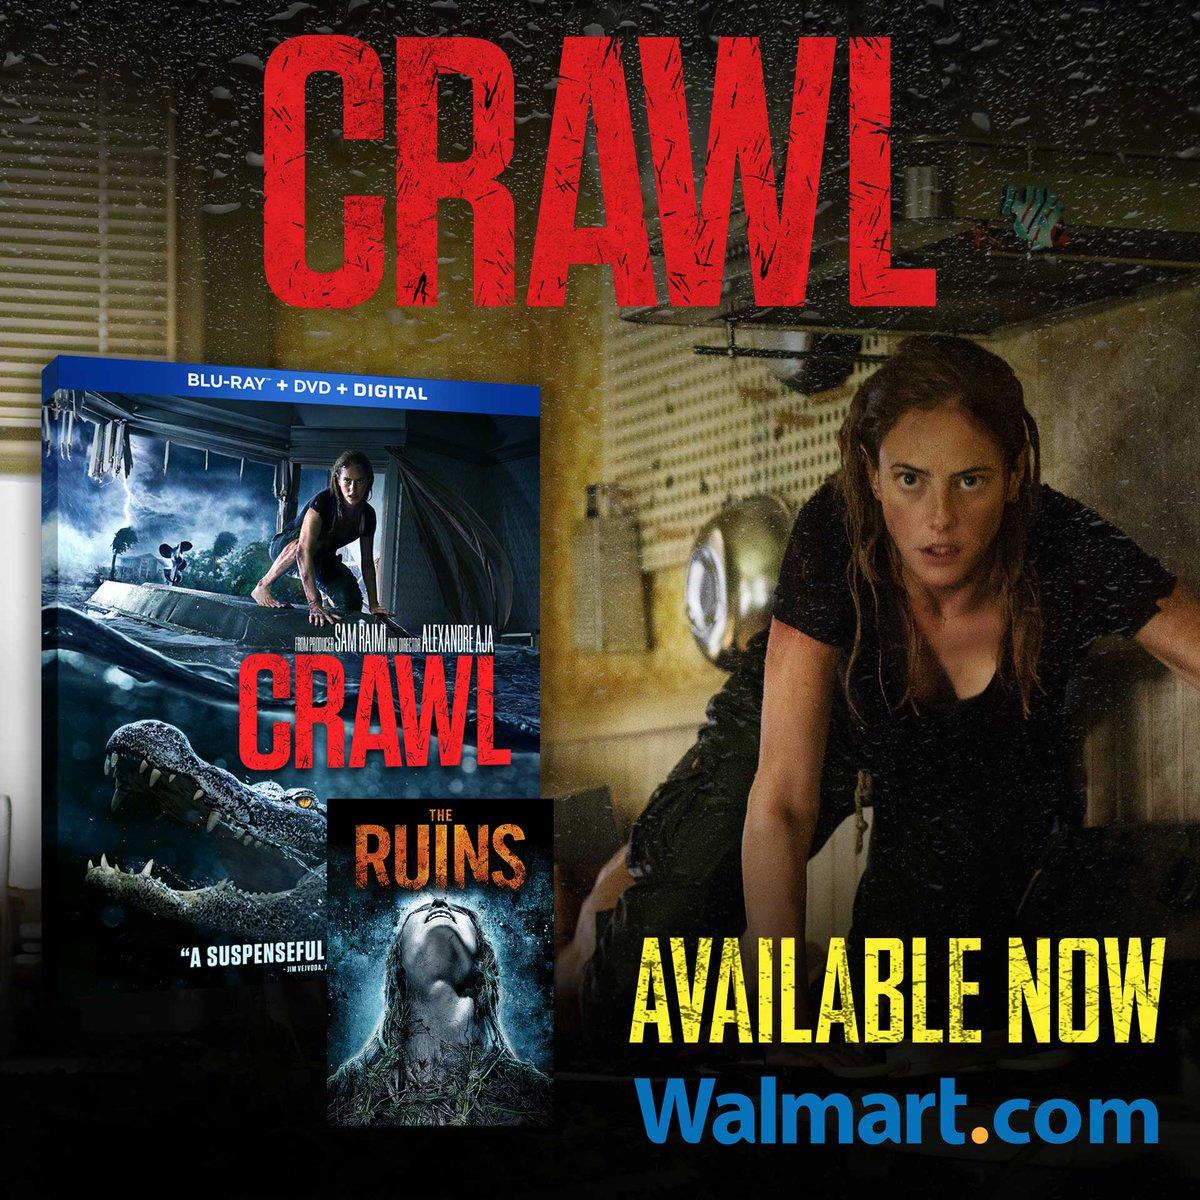 Crawl Movie Thecrawlmovie Twitter